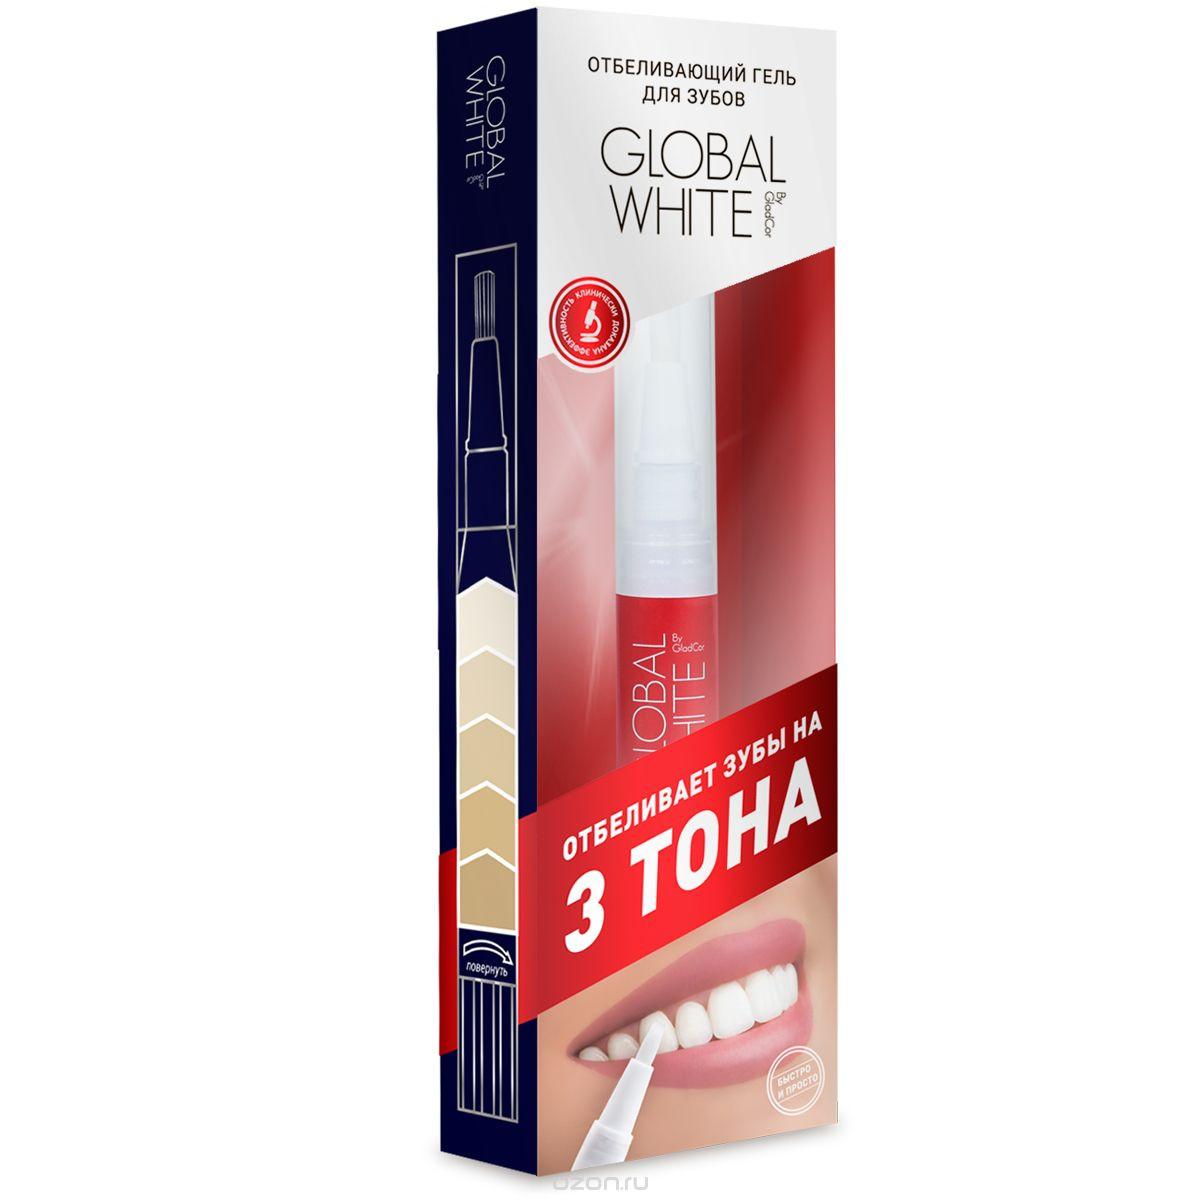 Глобал Вайт гель-карандаш отбеливающий (2-3 тона) 5мл